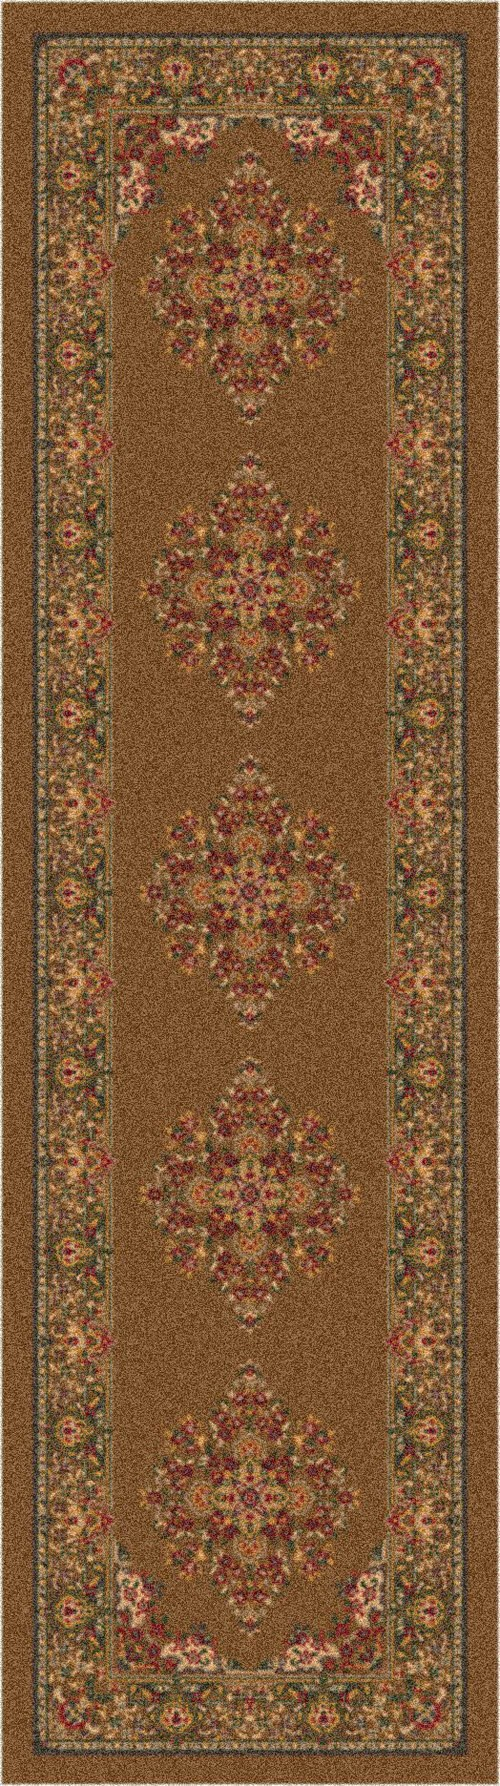 Umber (51)  Traditional / Oriental Area Rug